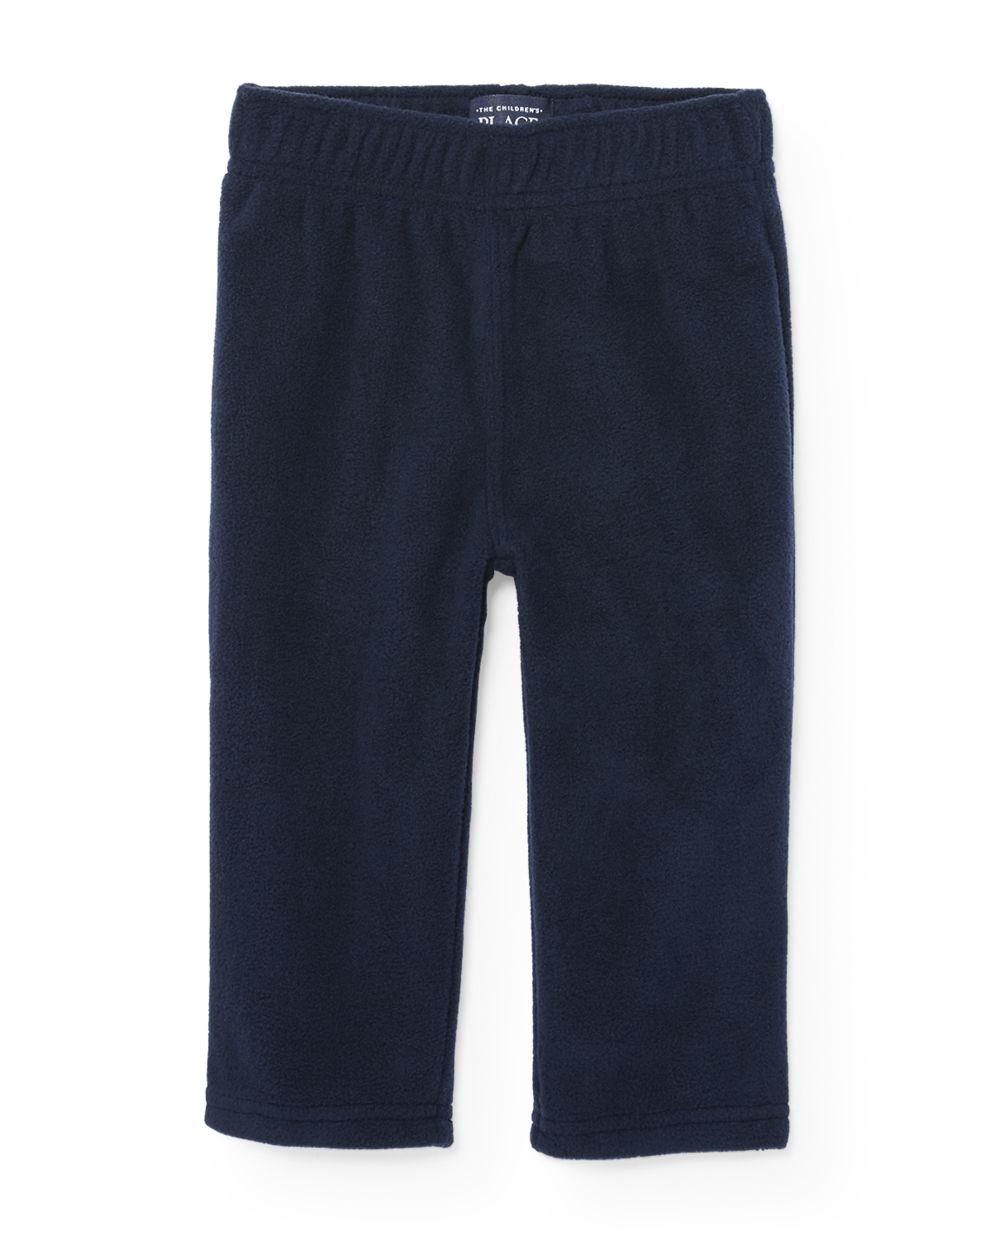 Toddler Boys Fleece Pants